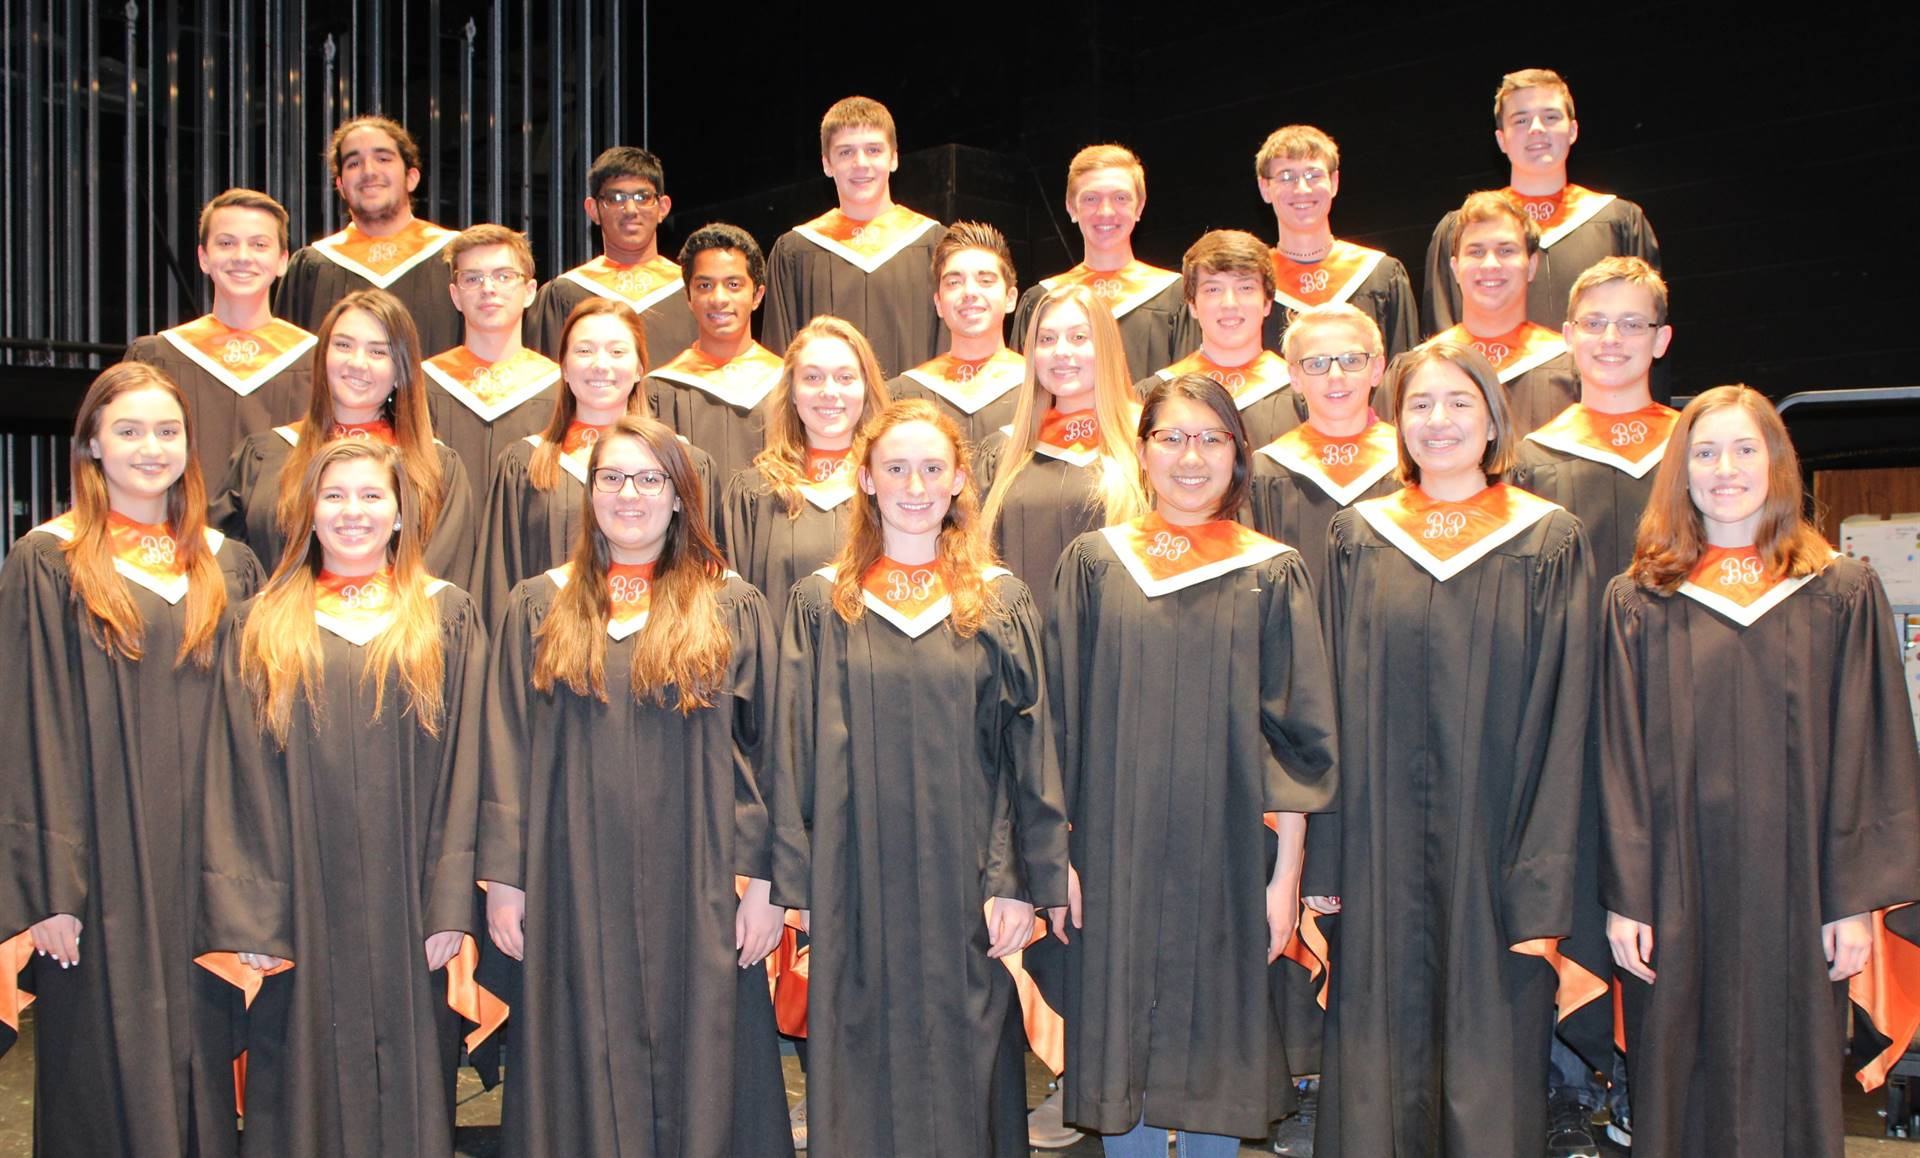 BPHS District Chorus students